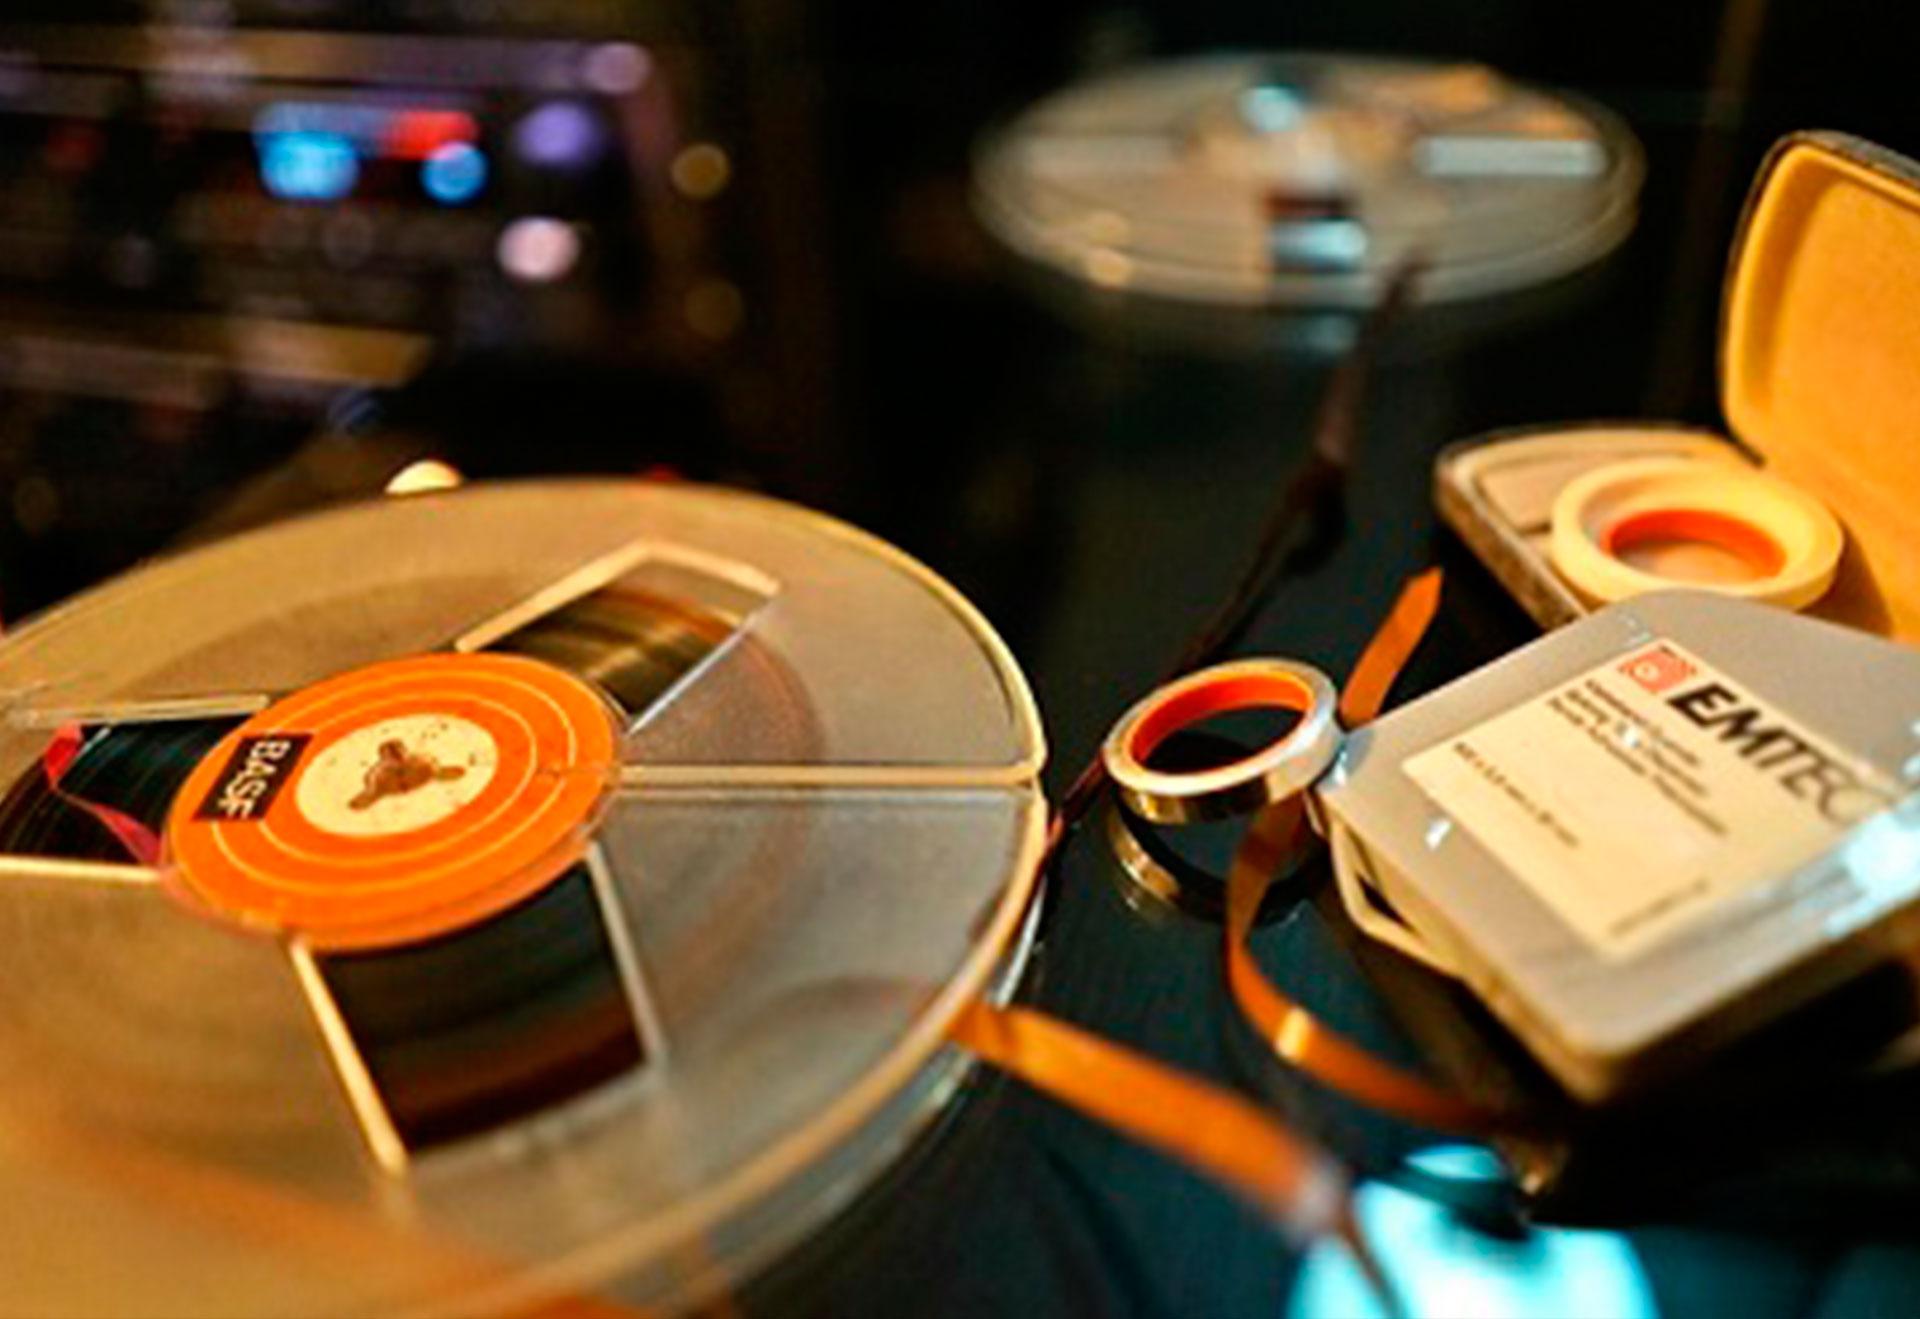 Reparación de bobinas de audio, open reel repairment